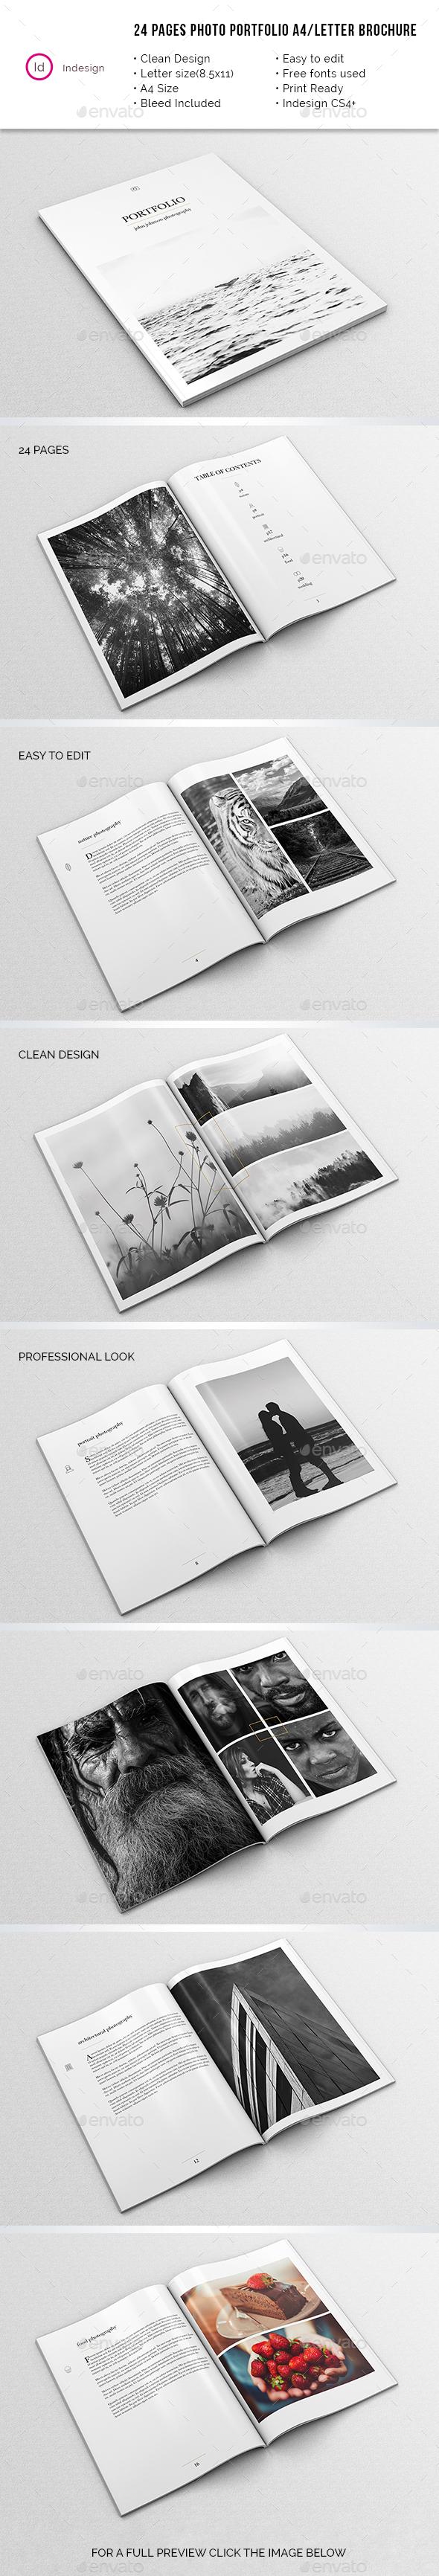 Photography Portfolio A4/Letter Brochure - Portfolio Brochures